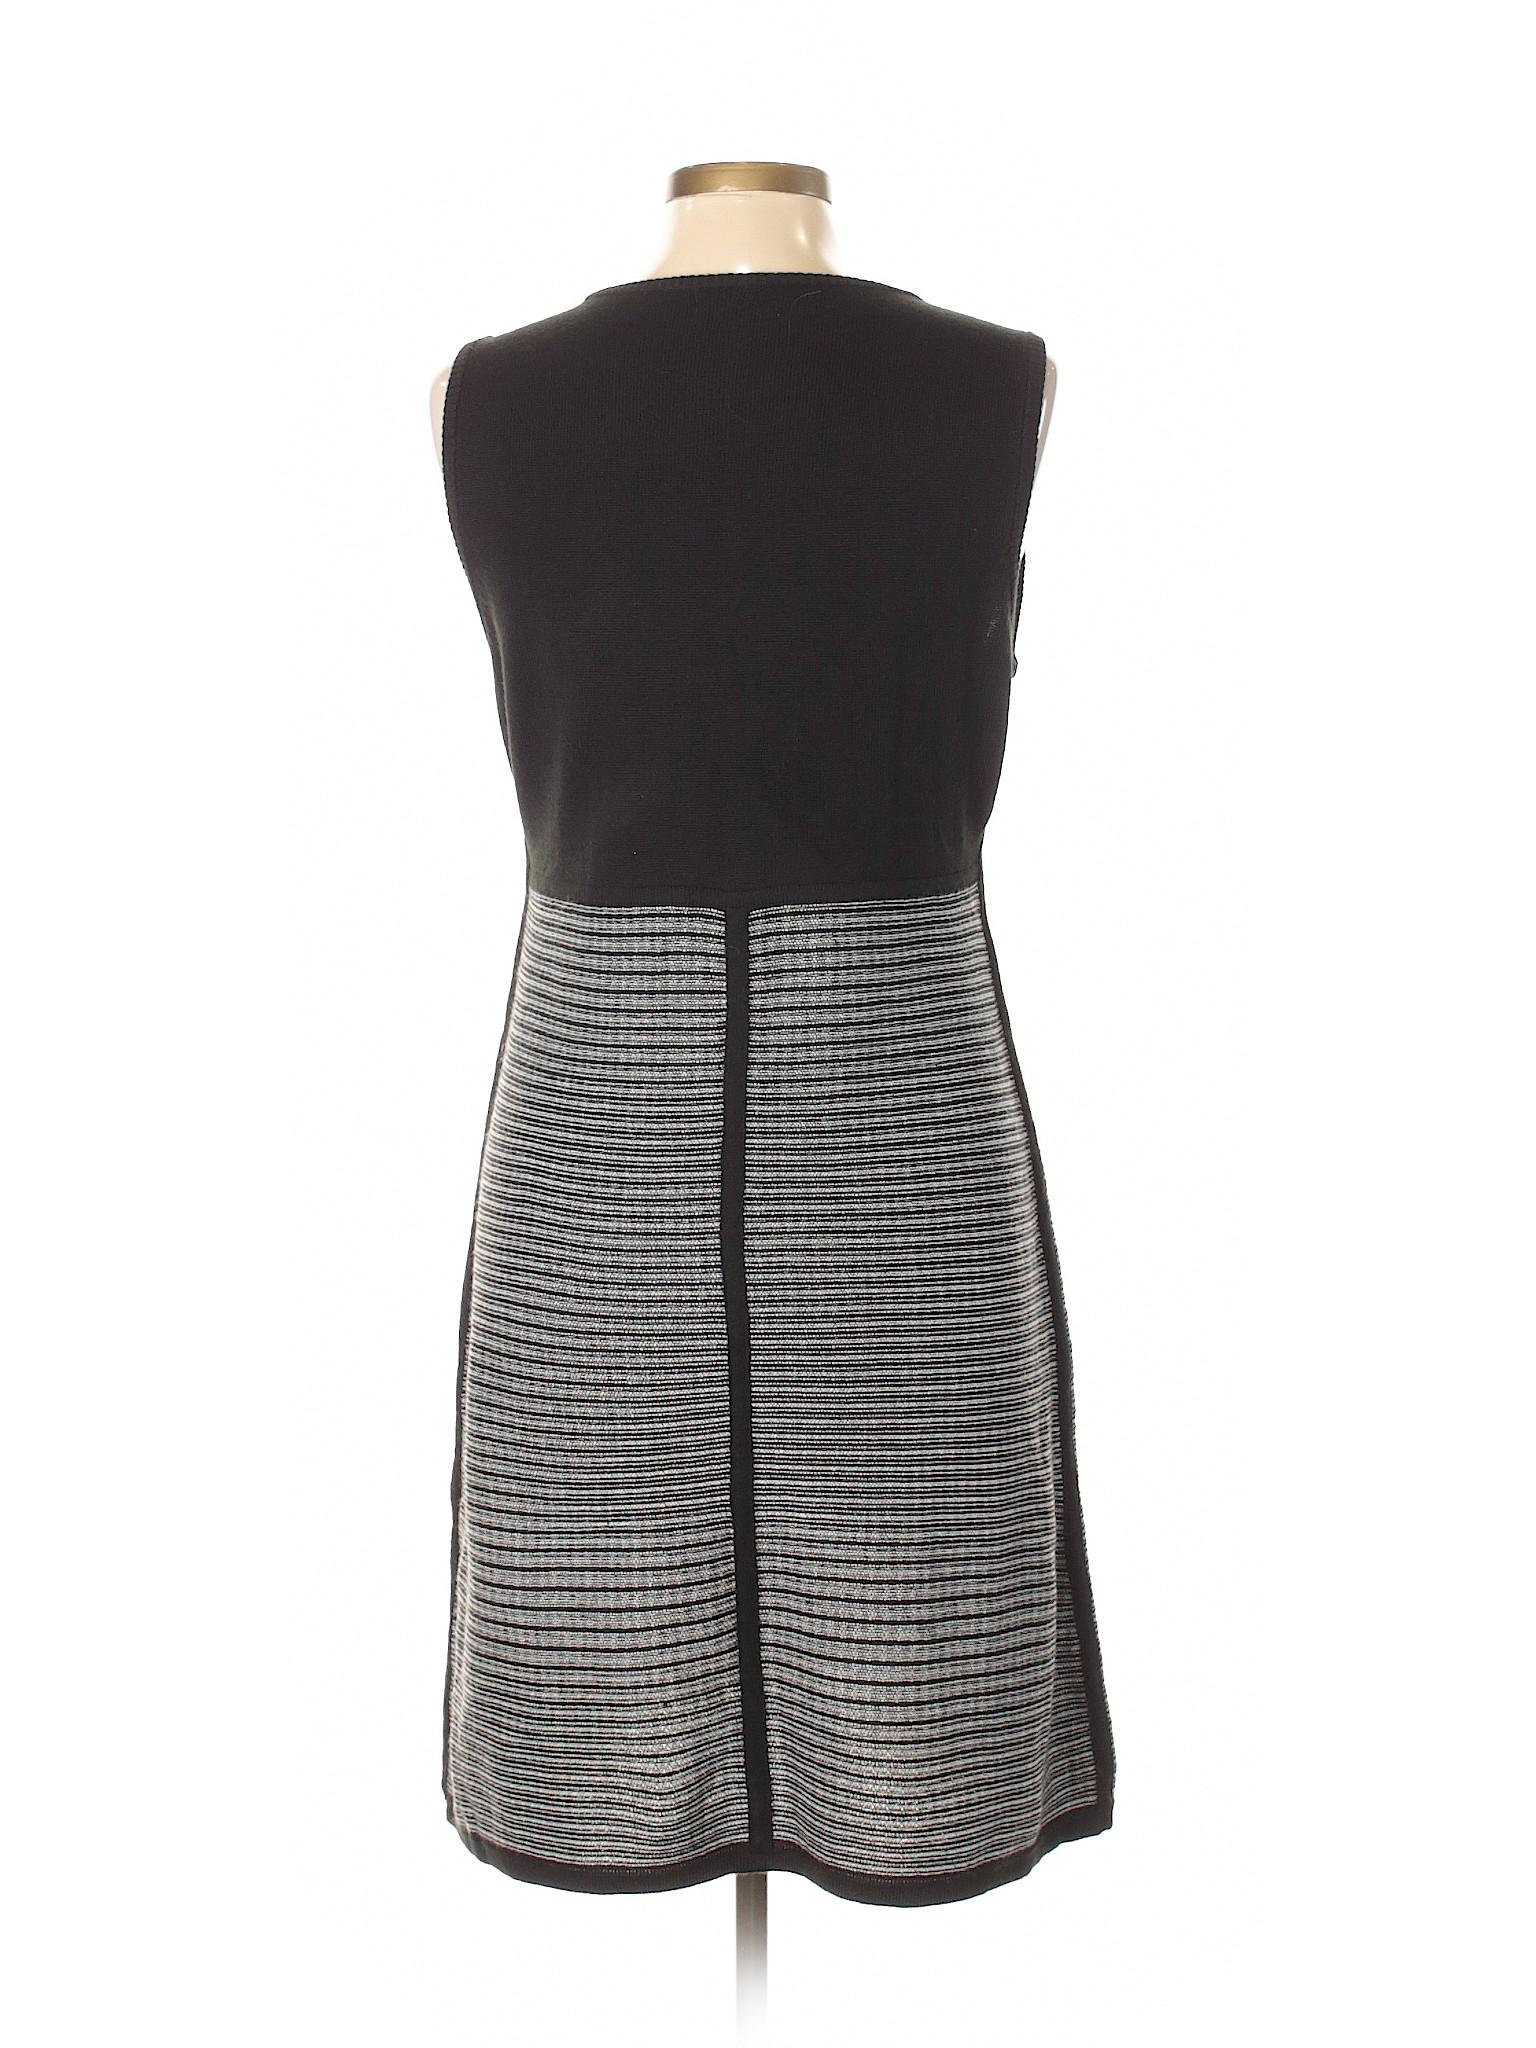 Dress Dress Selling Klein Selling Calvin Klein Calvin Casual Casual dWxTBwqWRp